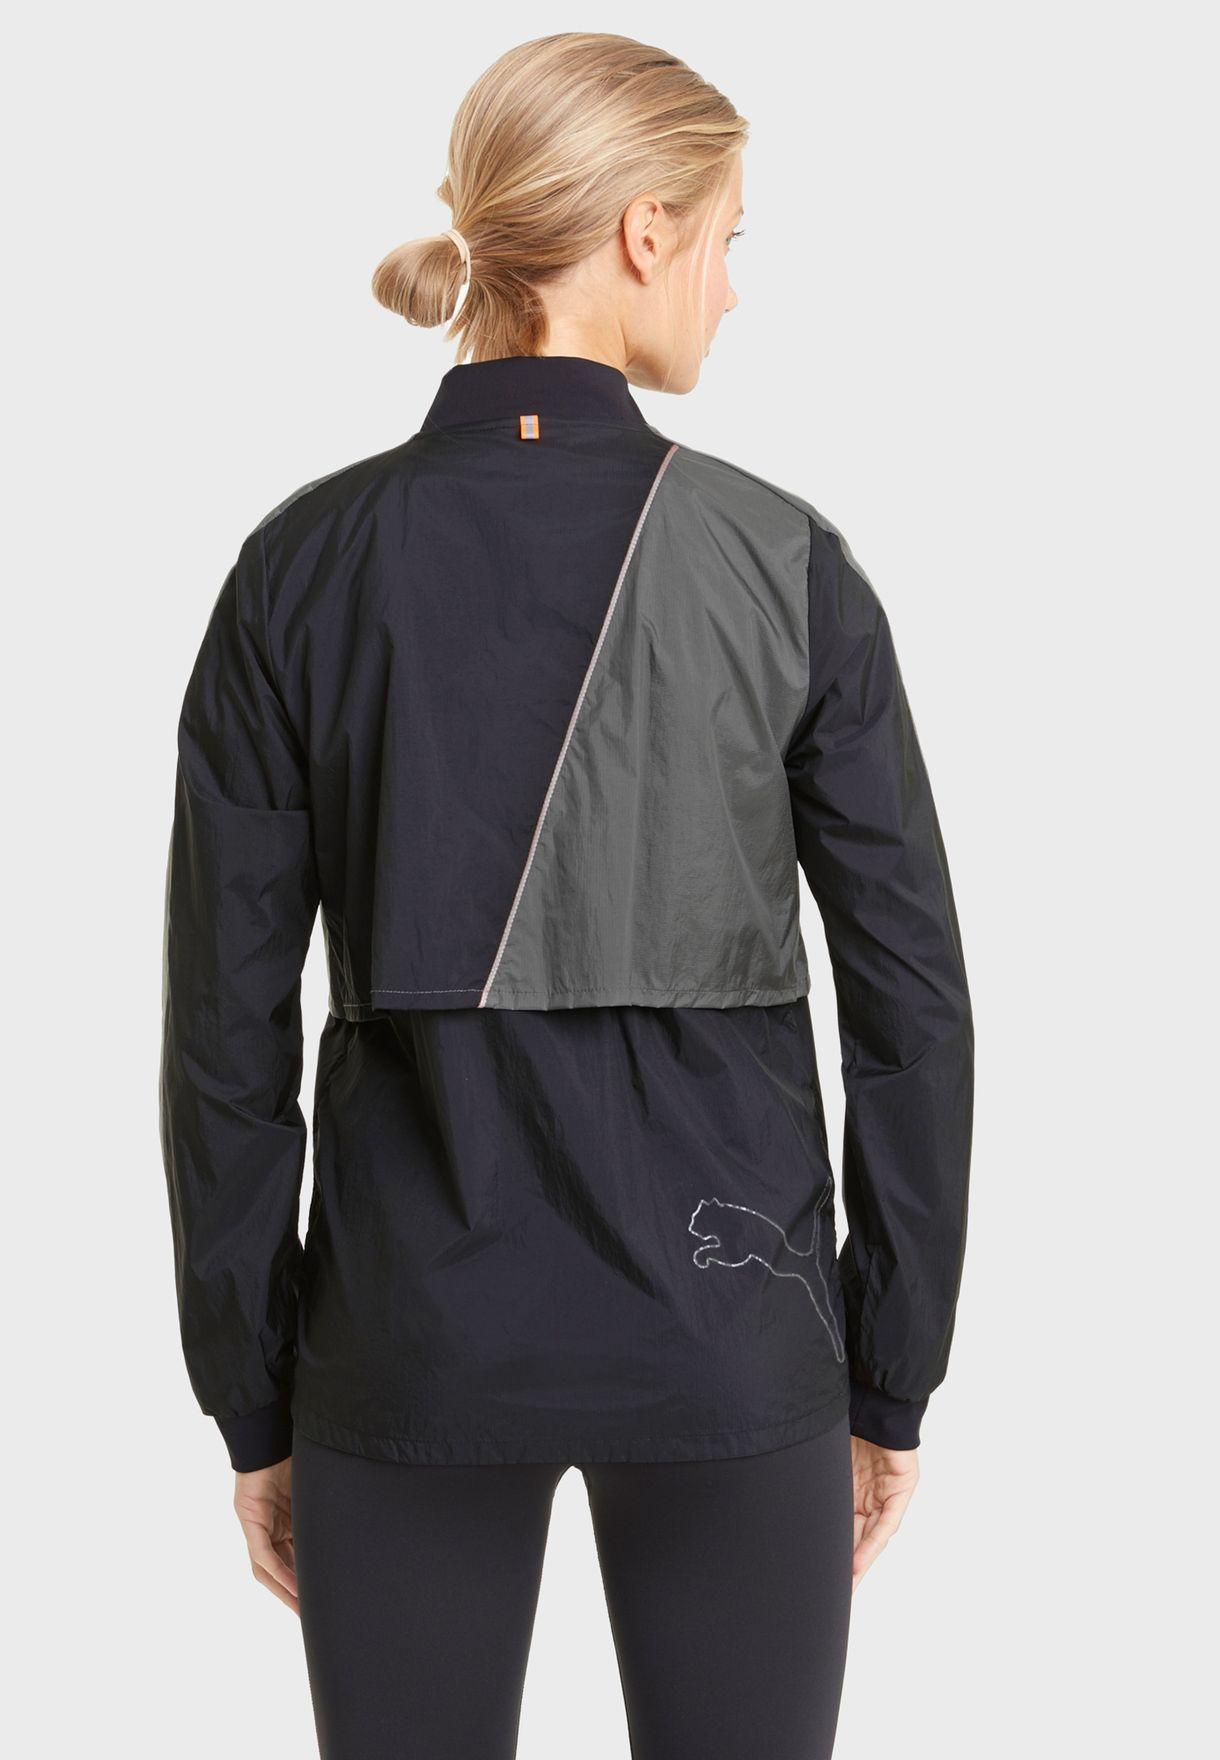 Run Launch Ultra Jacket